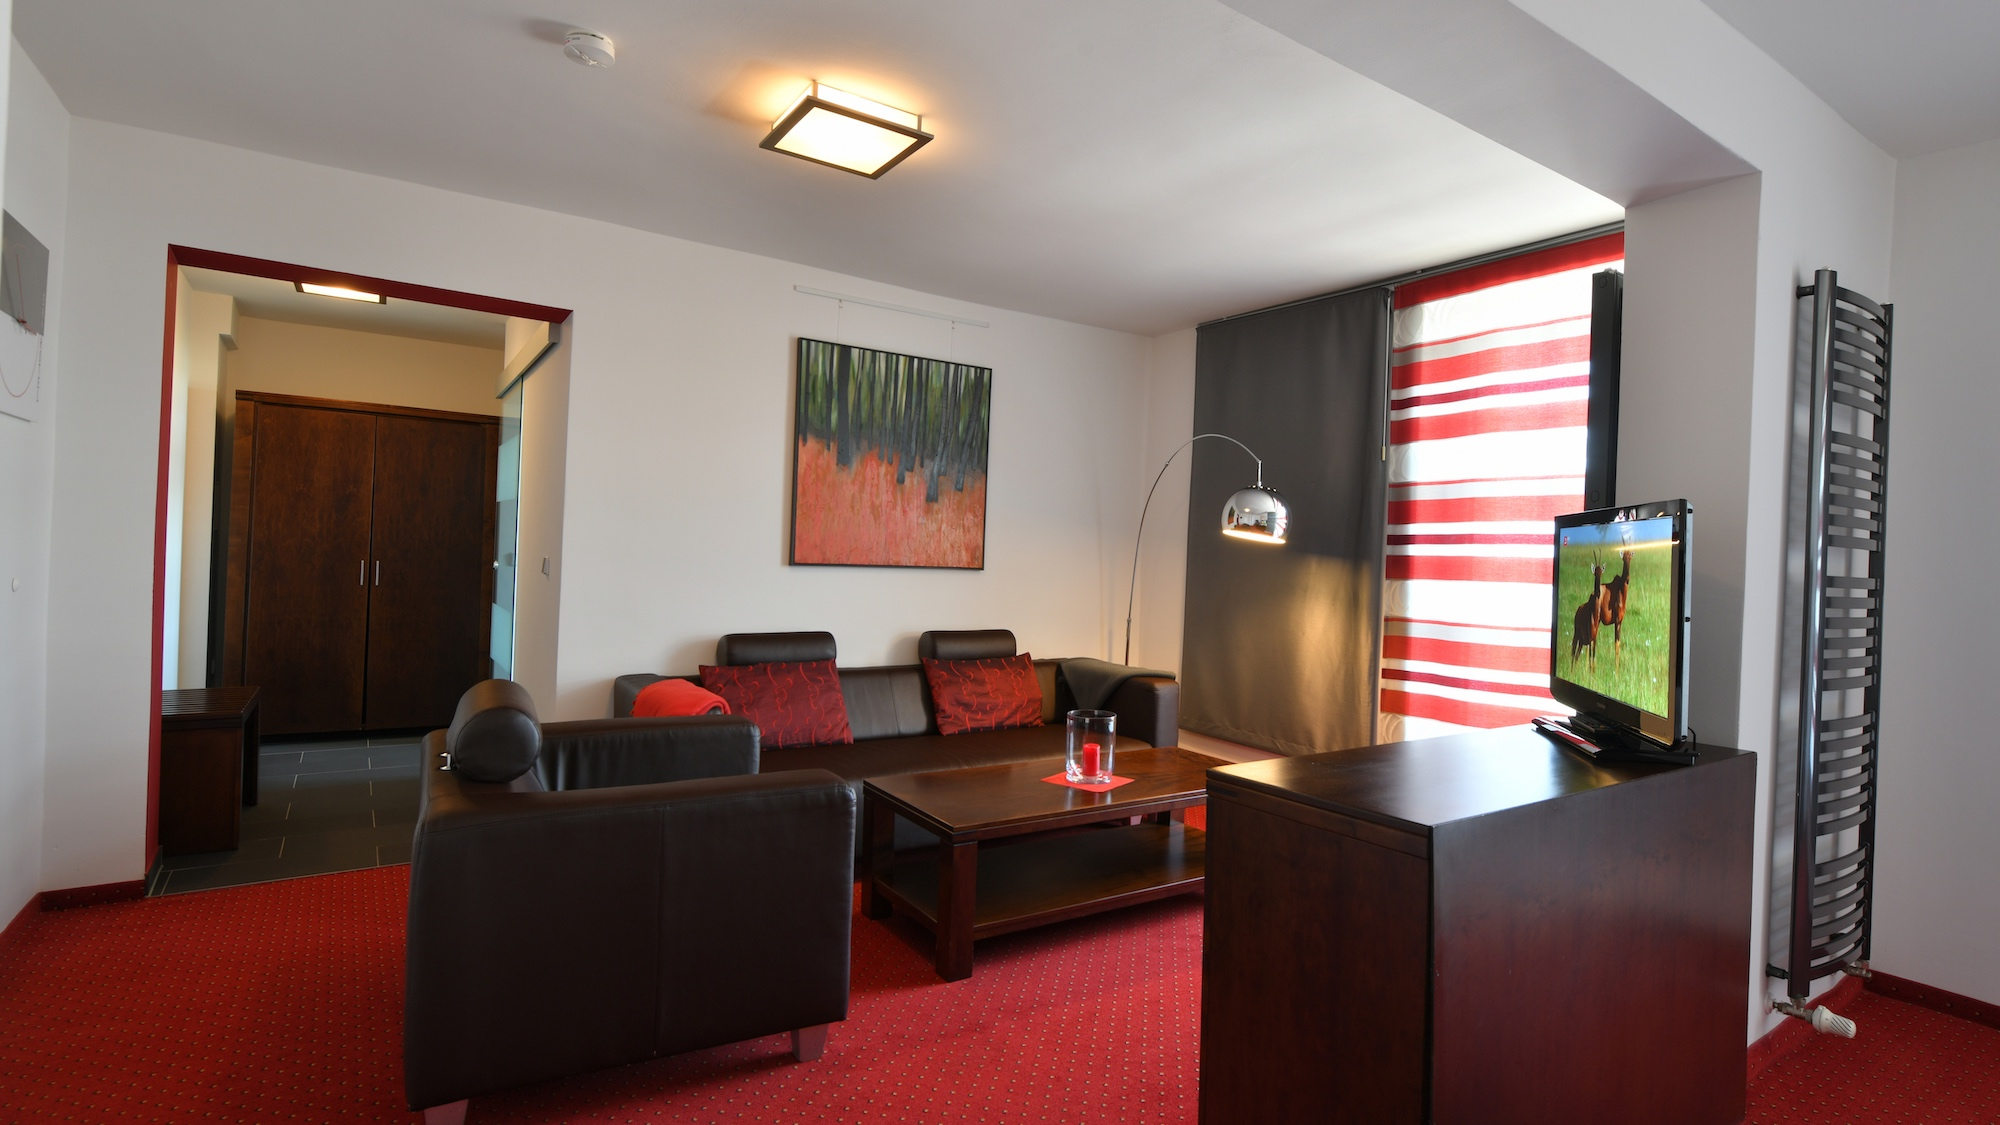 Hotel Merseburg Leuna Suite Zimmer Skyhotel